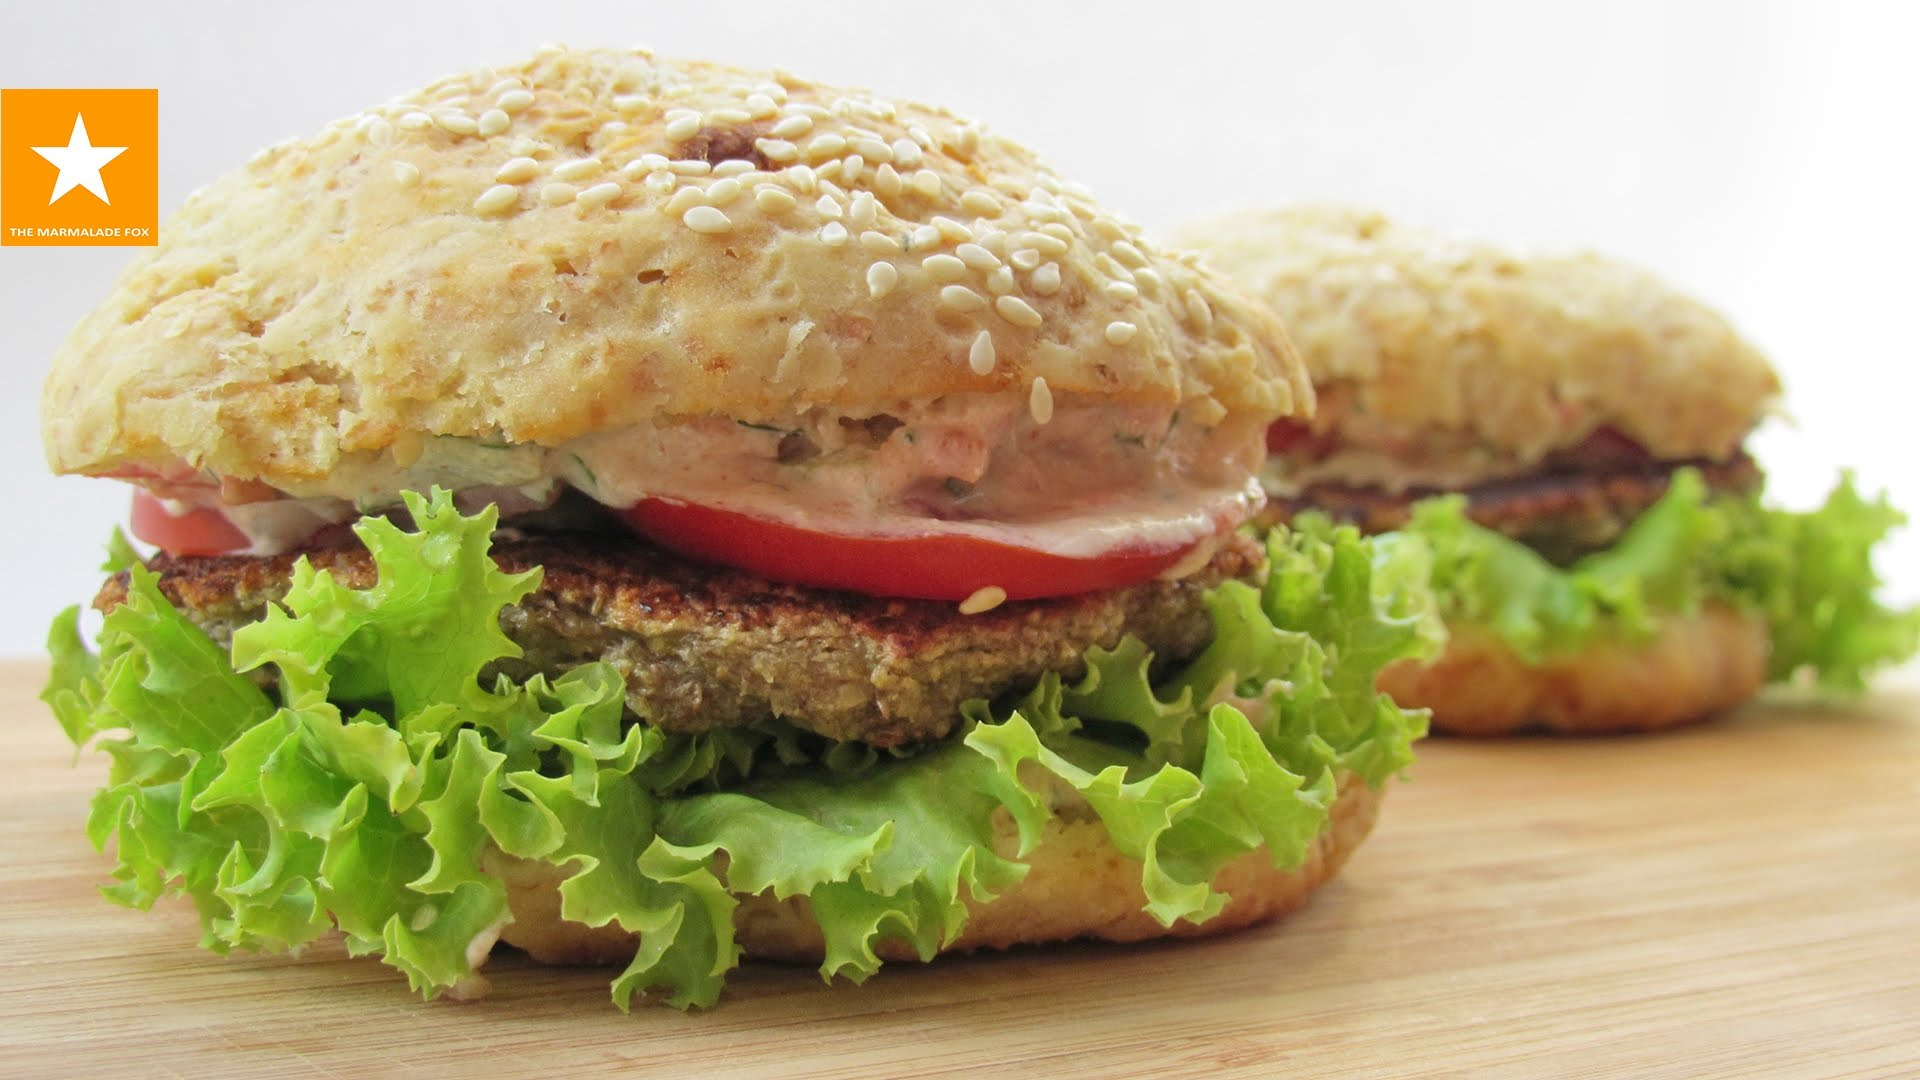 вегетарианский гамбургер